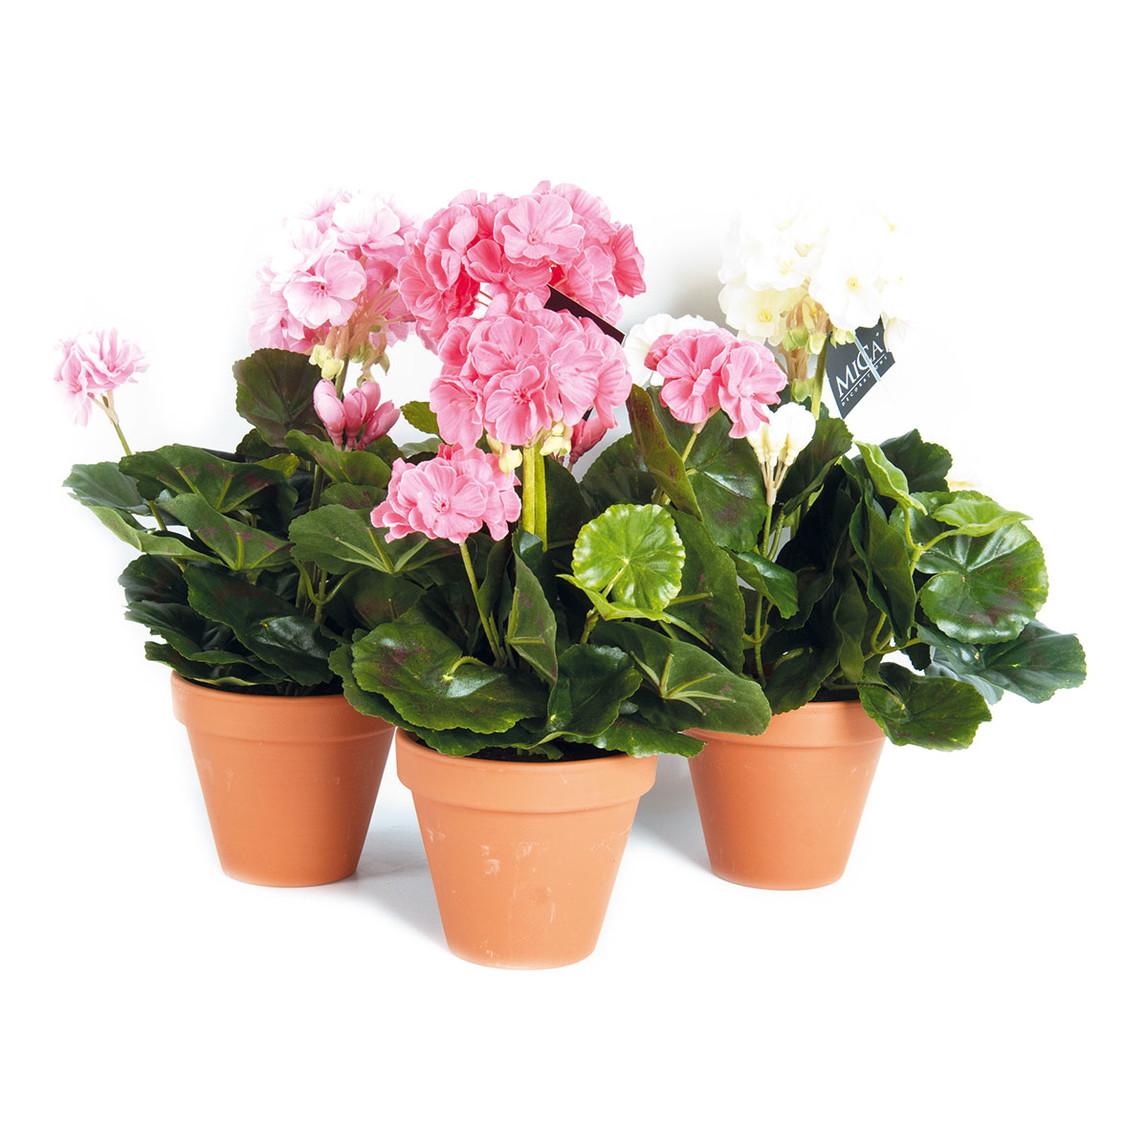 MICA Saksıda Sardunya Yapay Çiçek Koyu Pembe